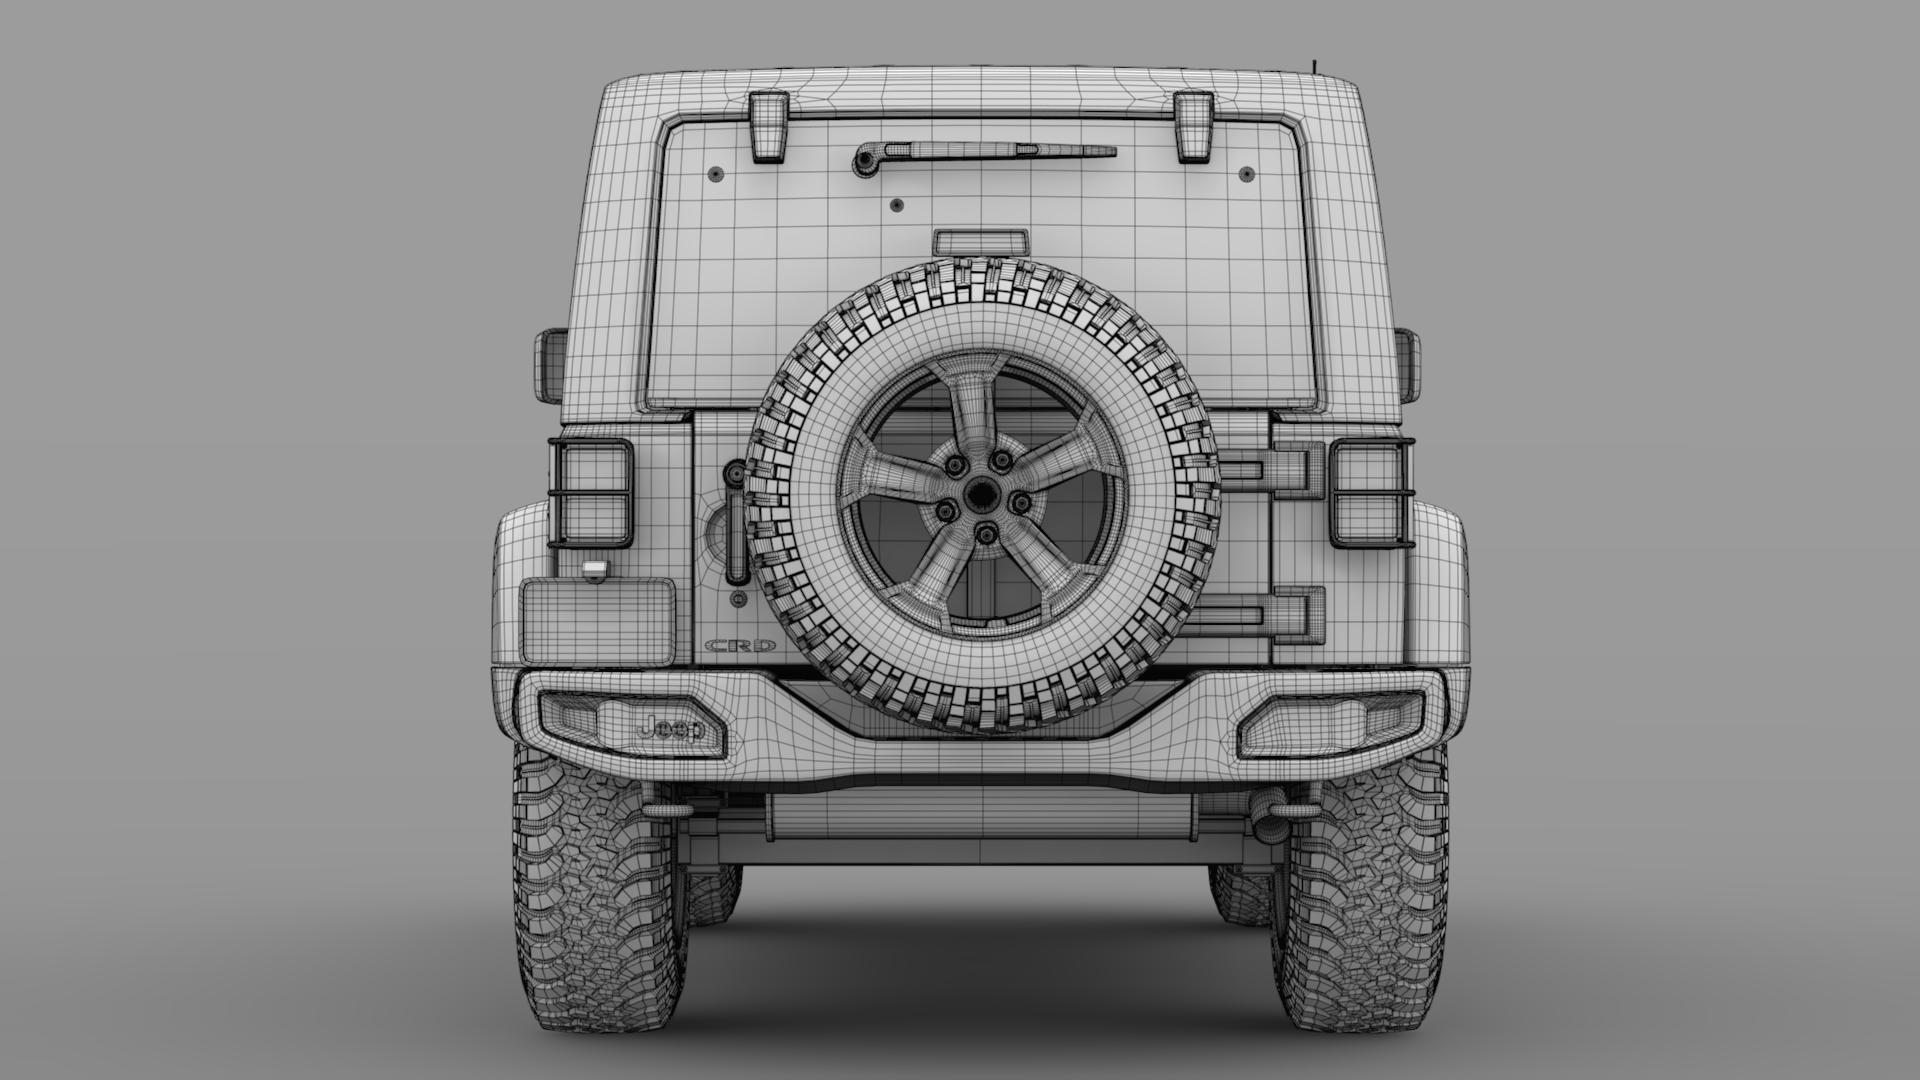 jeep wrangler rubicon recon jk 2017 3d model max fbx lwo ma mb hrc xsi obj 276954